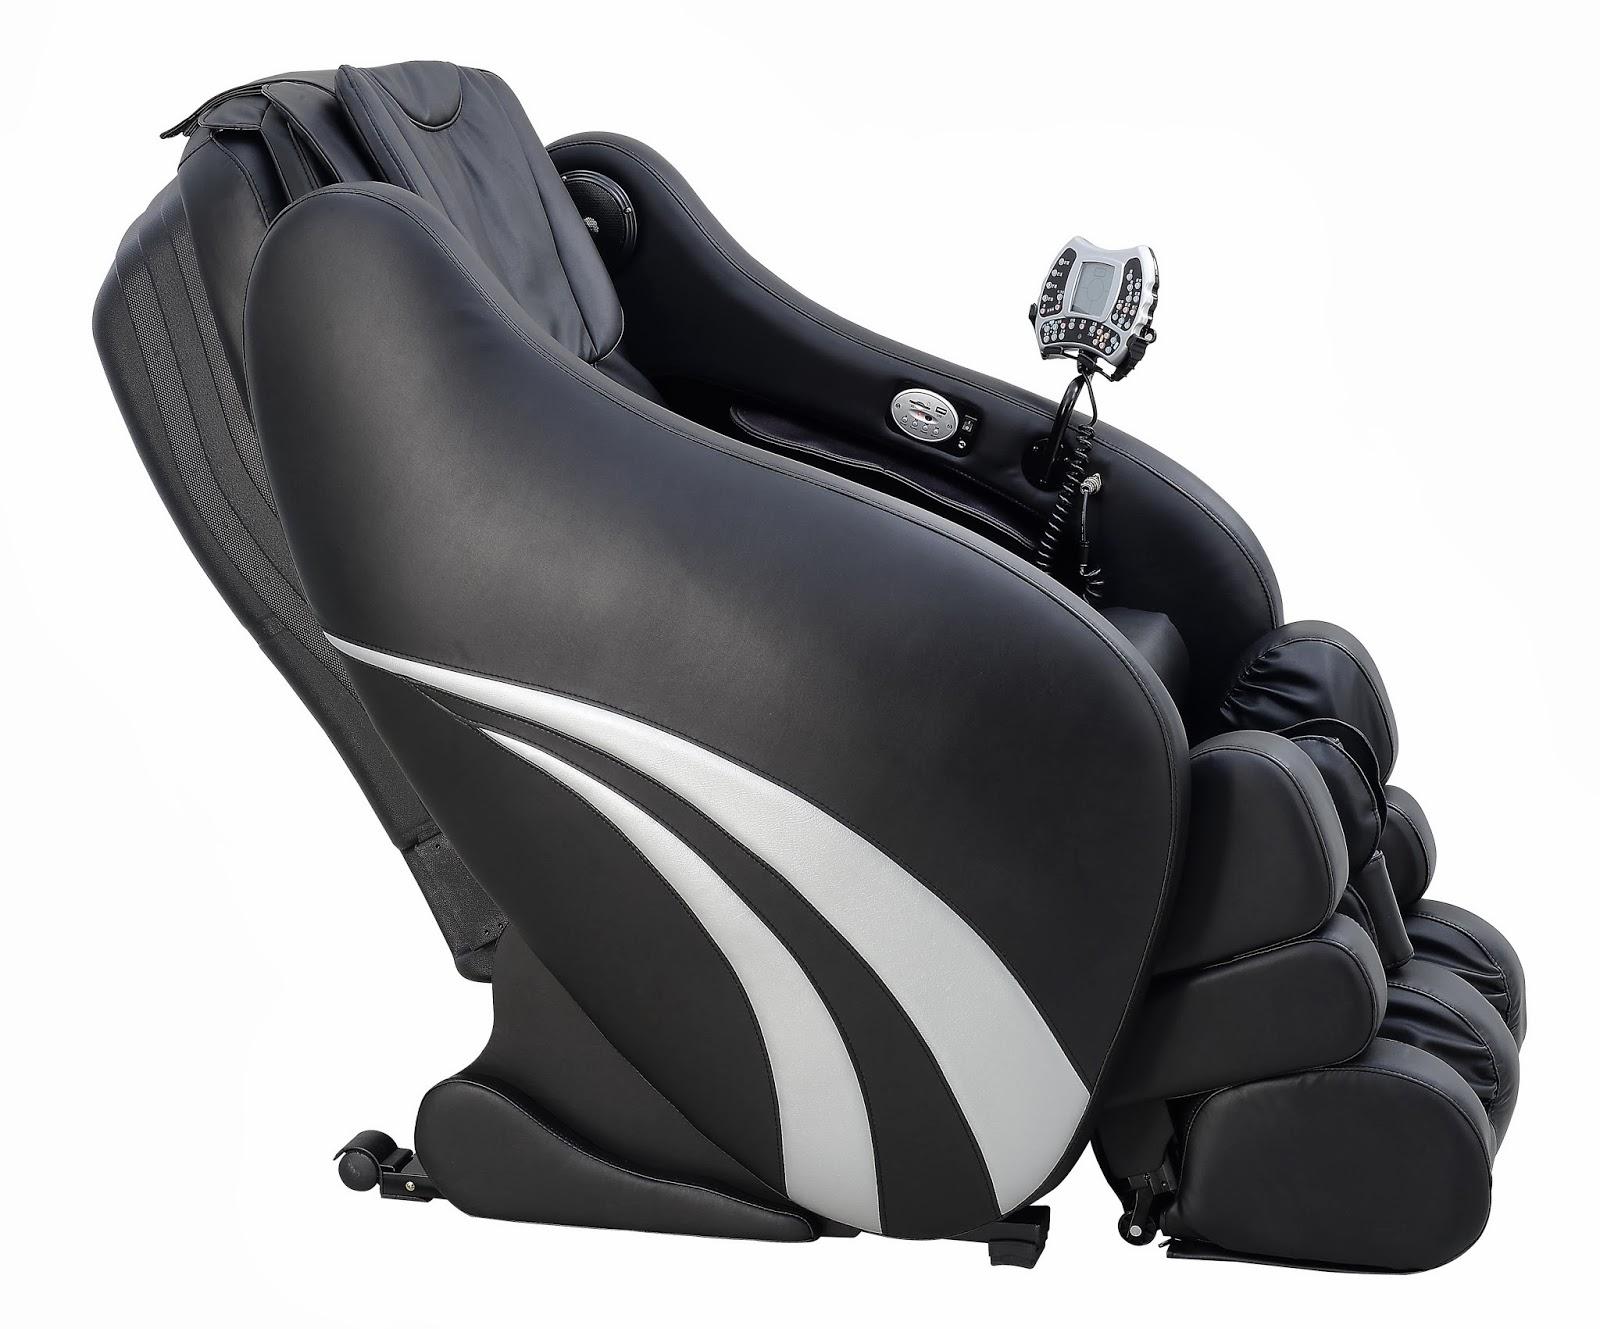 keyton massagesessel test und vergleich dezember 2013. Black Bedroom Furniture Sets. Home Design Ideas